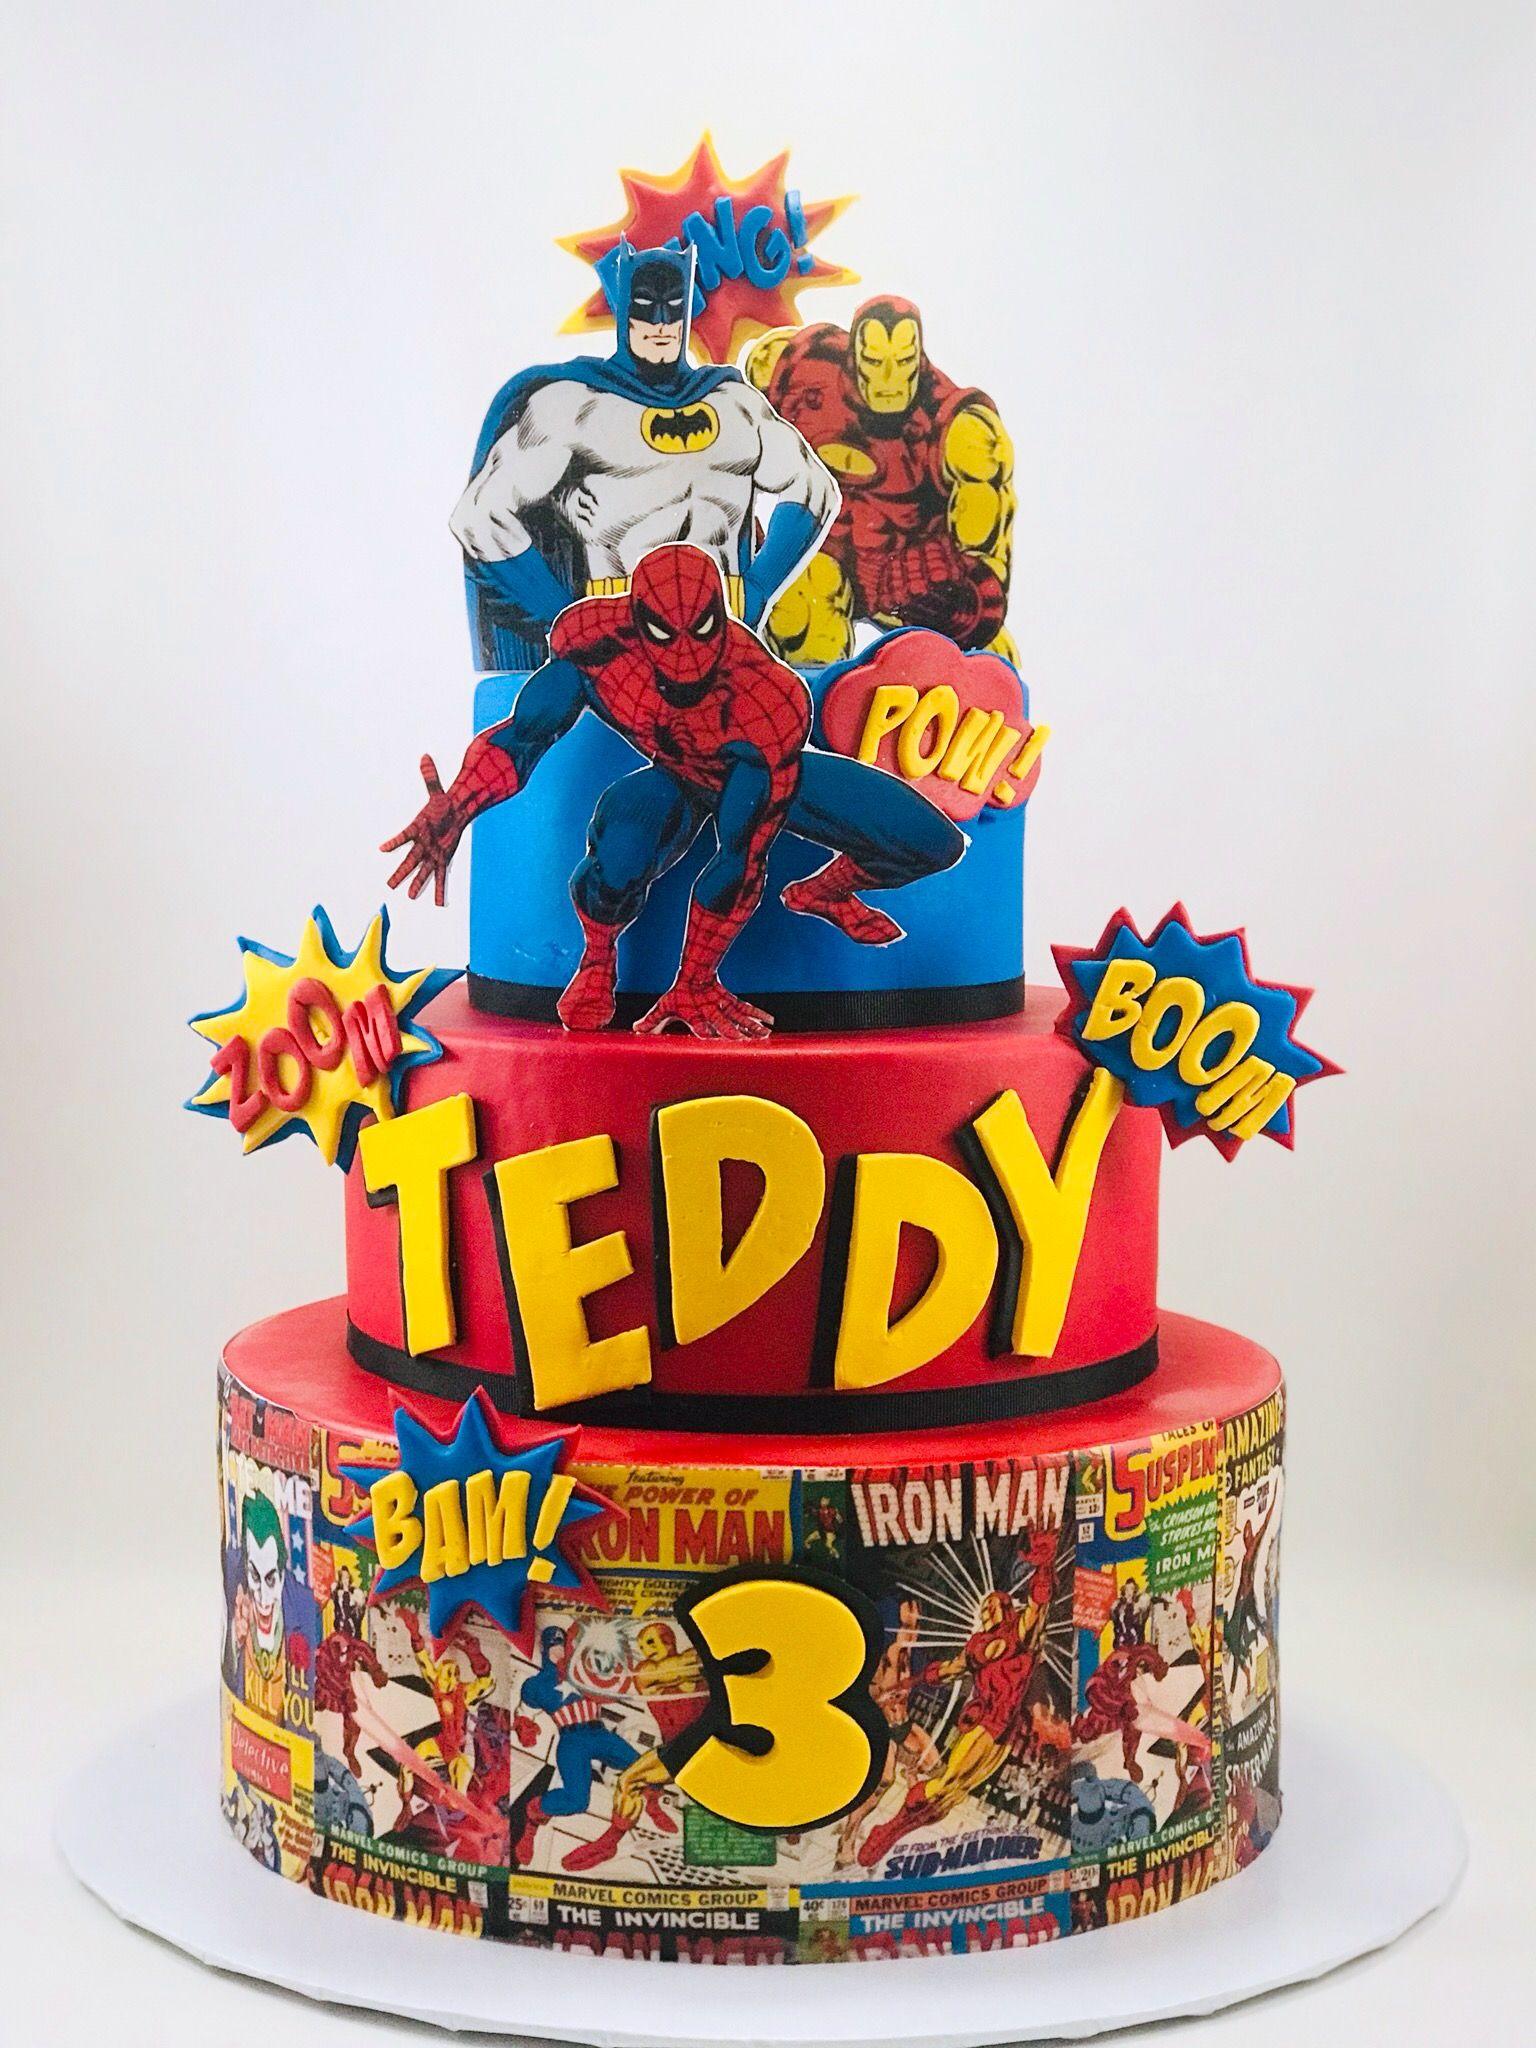 Superhero Comic Book Cake By Paris Custom Cakes With Images